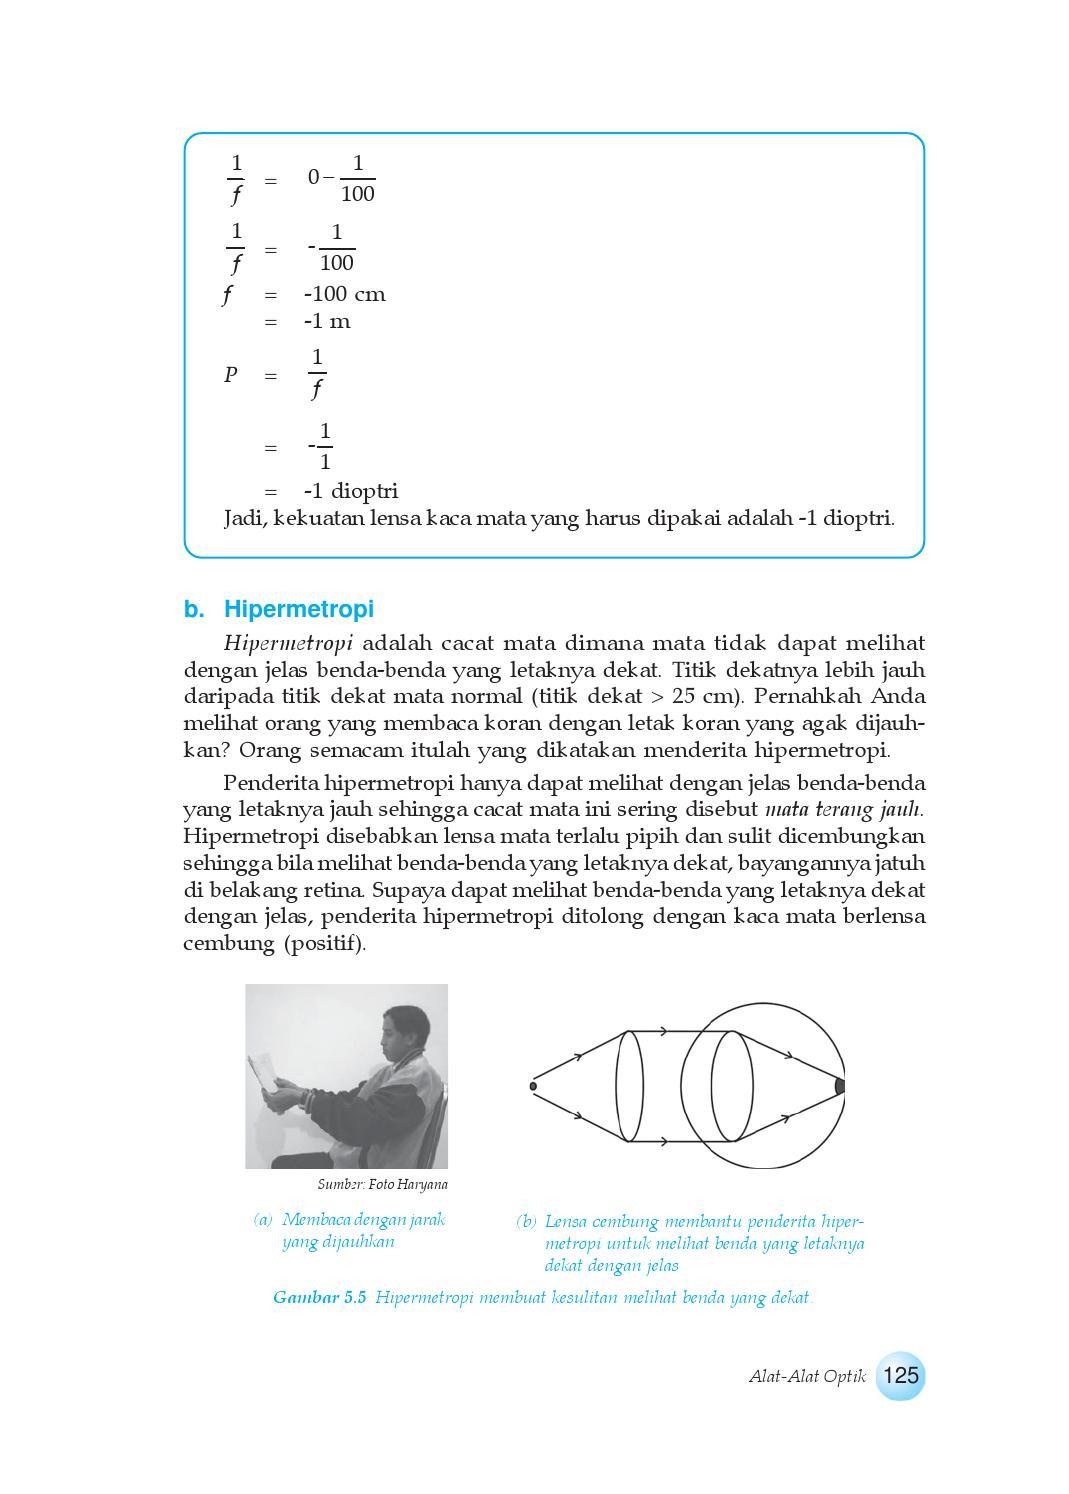 hipermetropie 1 5)